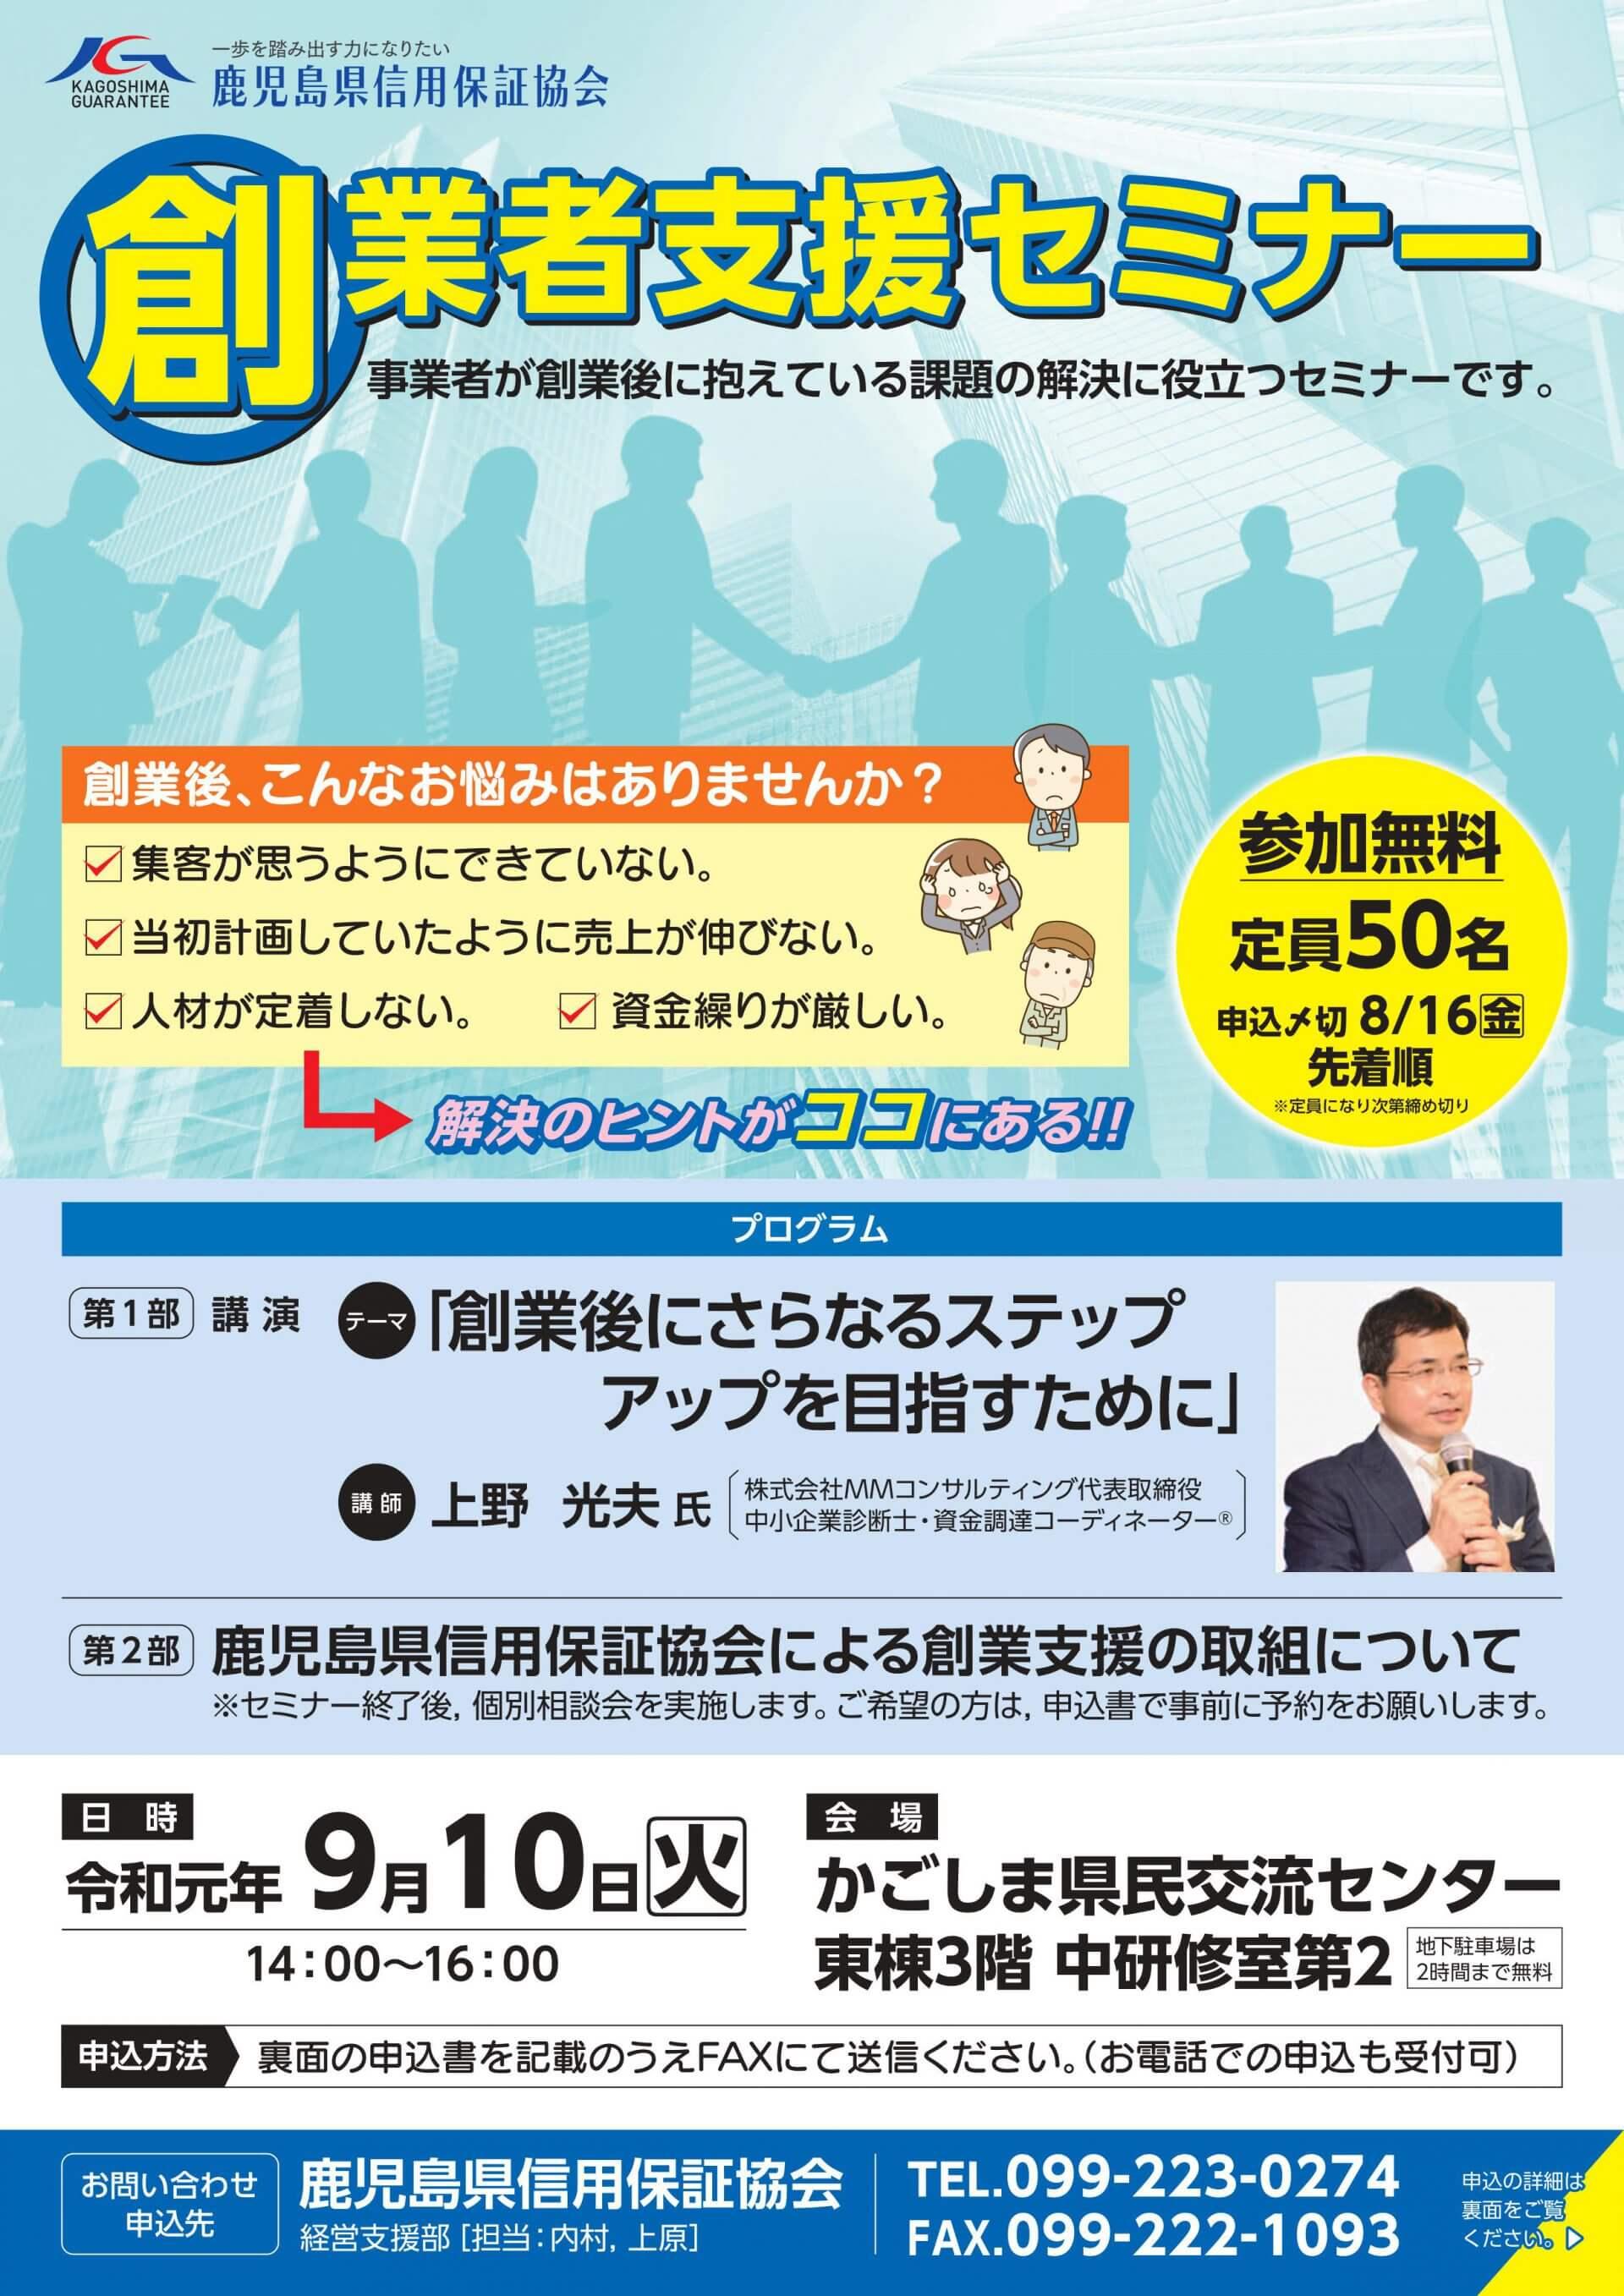 鹿児島県信用保証協会「創業者支援セミナー」